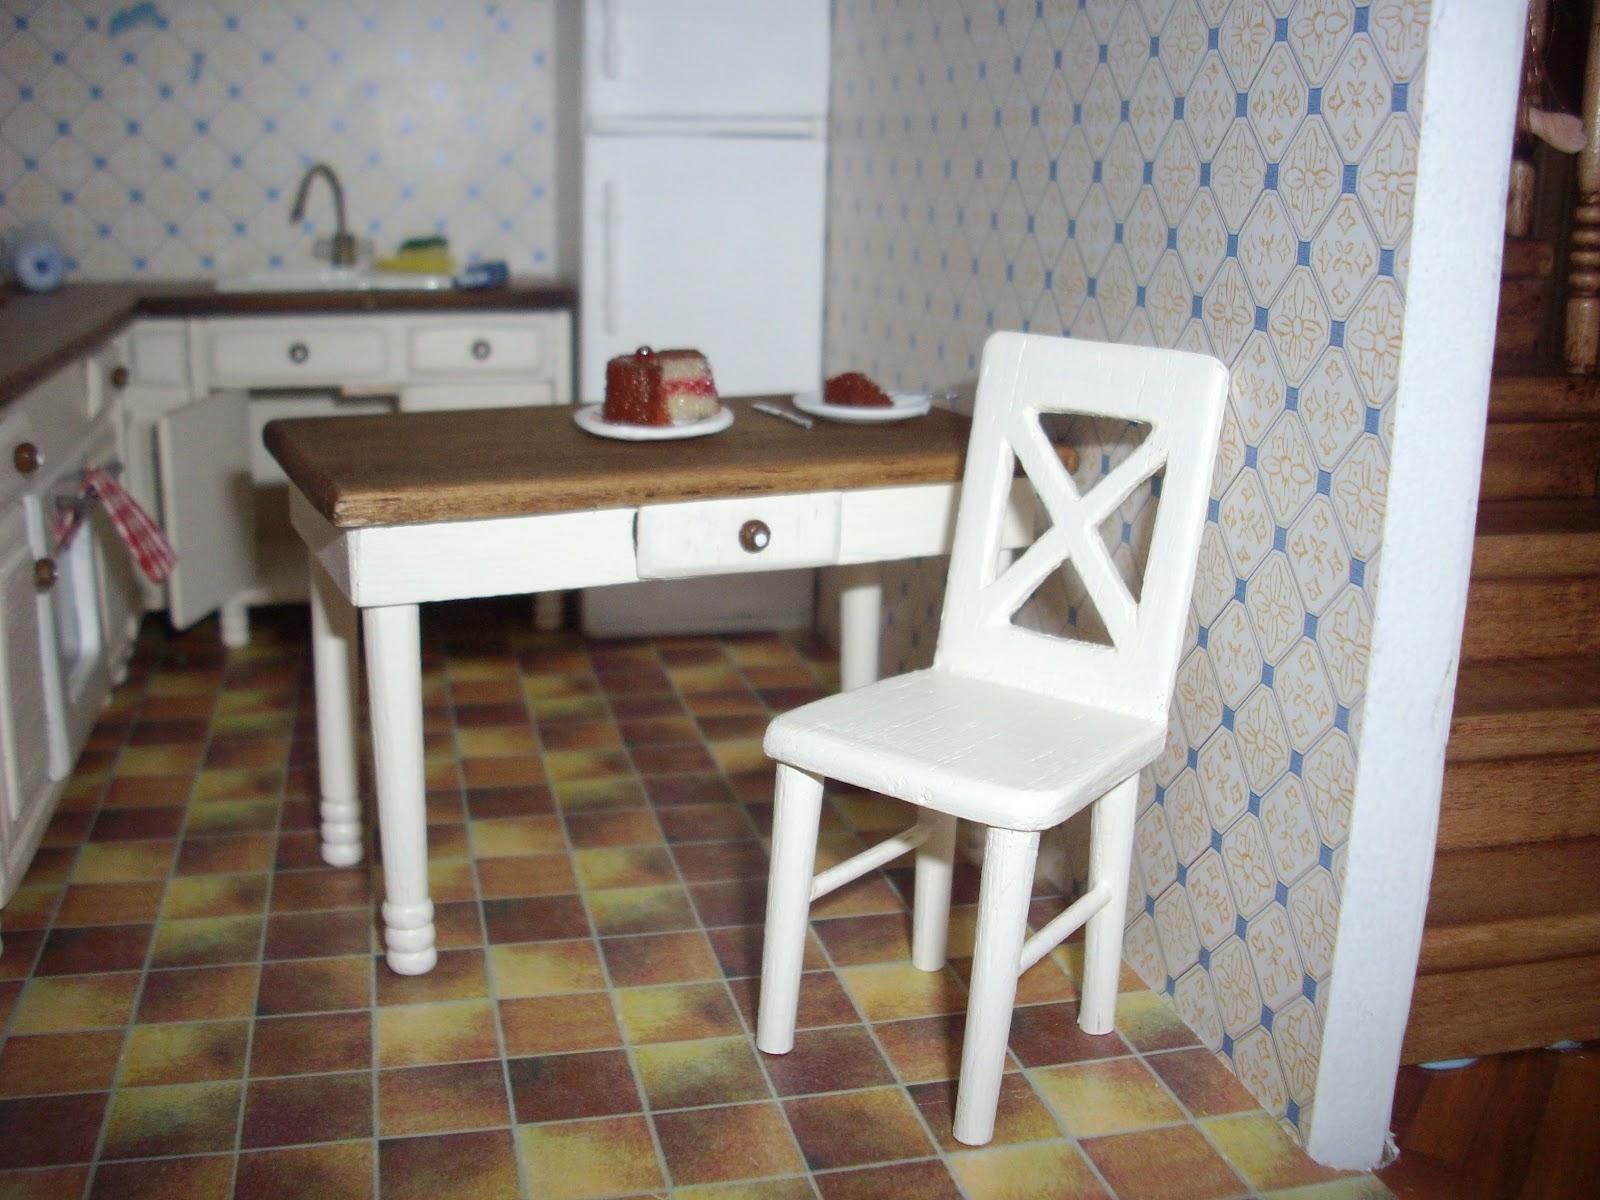 Newer Silla Para Cocina Plans - H4CK.US